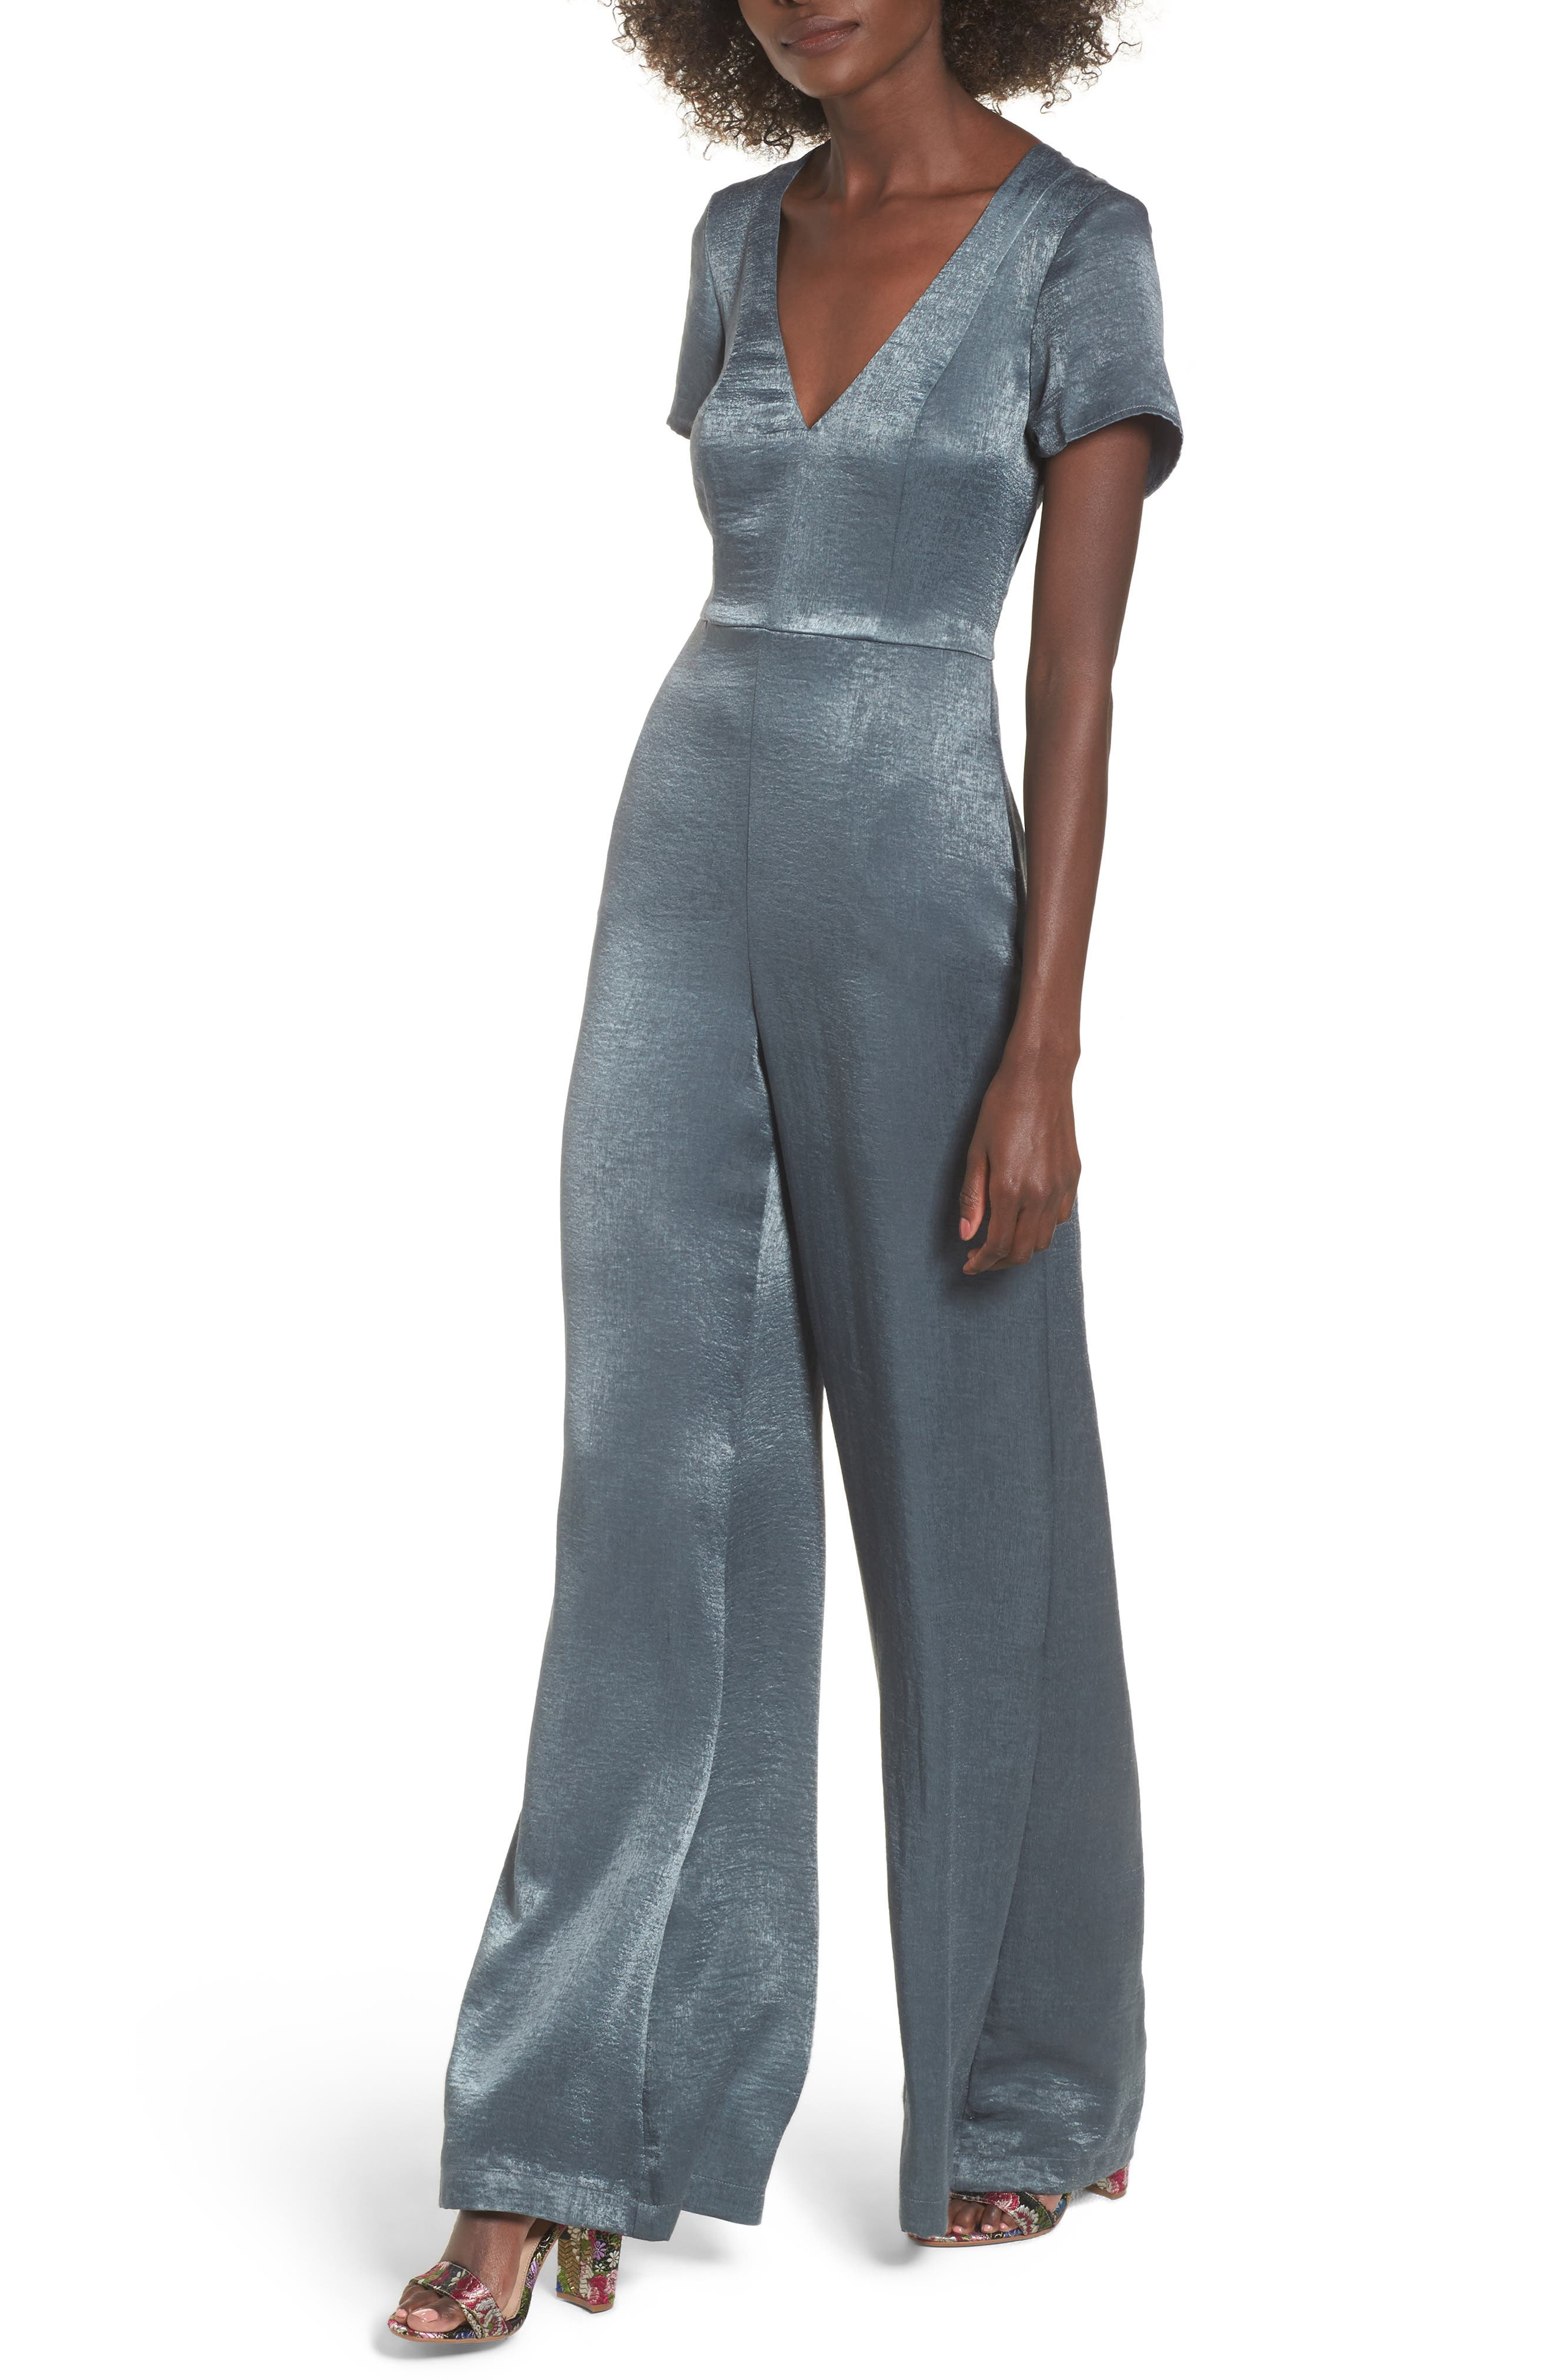 Main Image - Show Me Your Mumu Brianna Jumpsuit